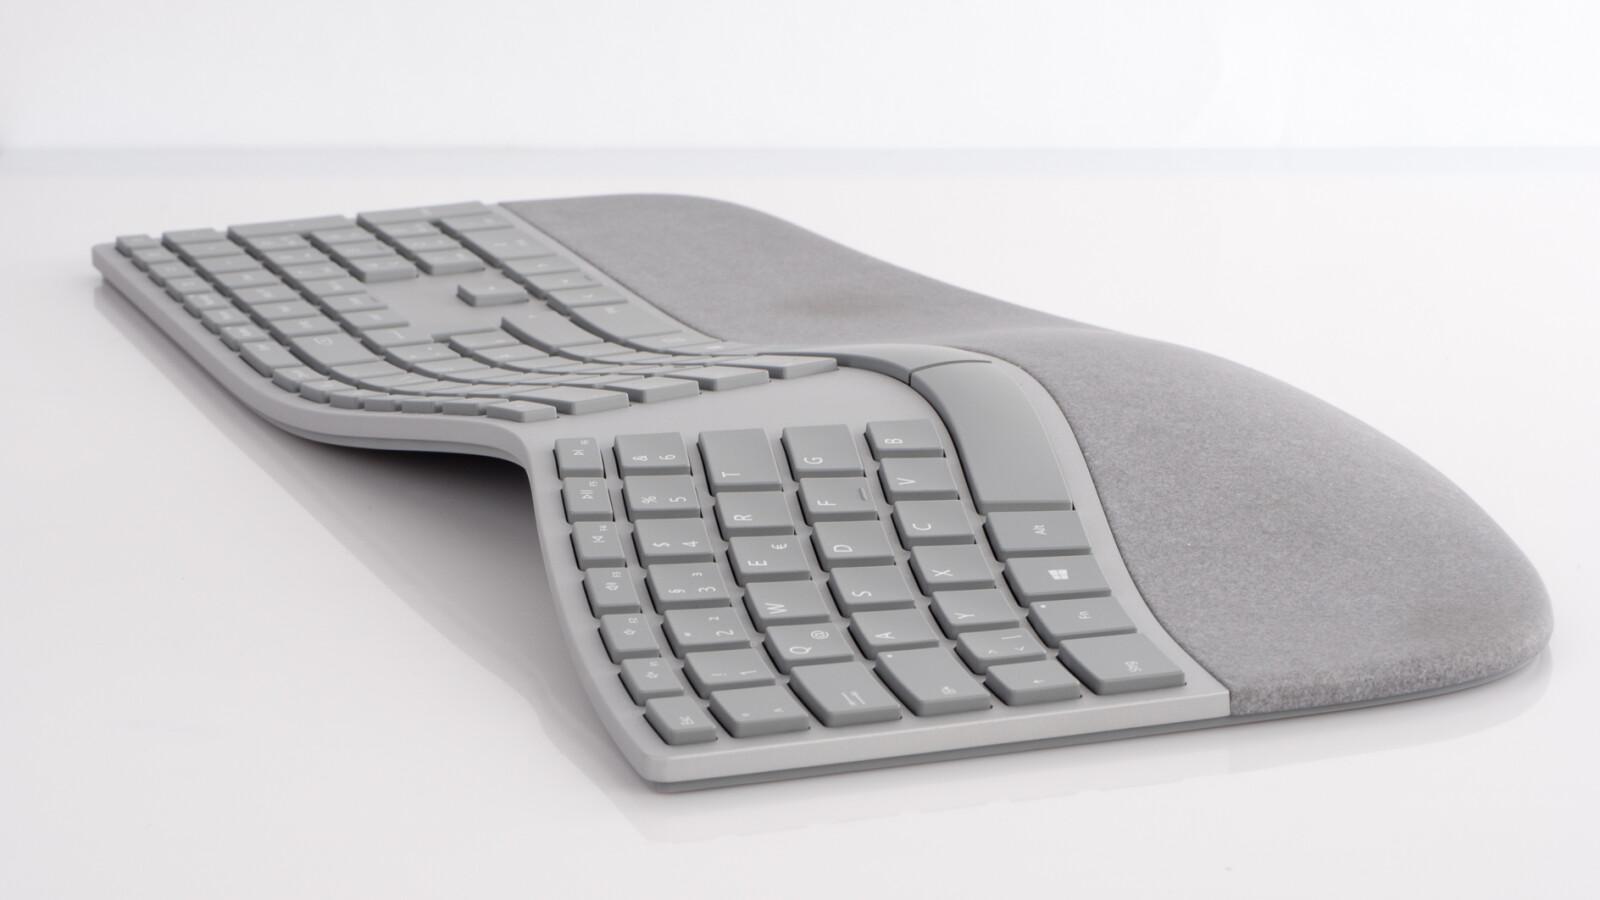 microsoft surface ergonomic keyboard im test diese. Black Bedroom Furniture Sets. Home Design Ideas